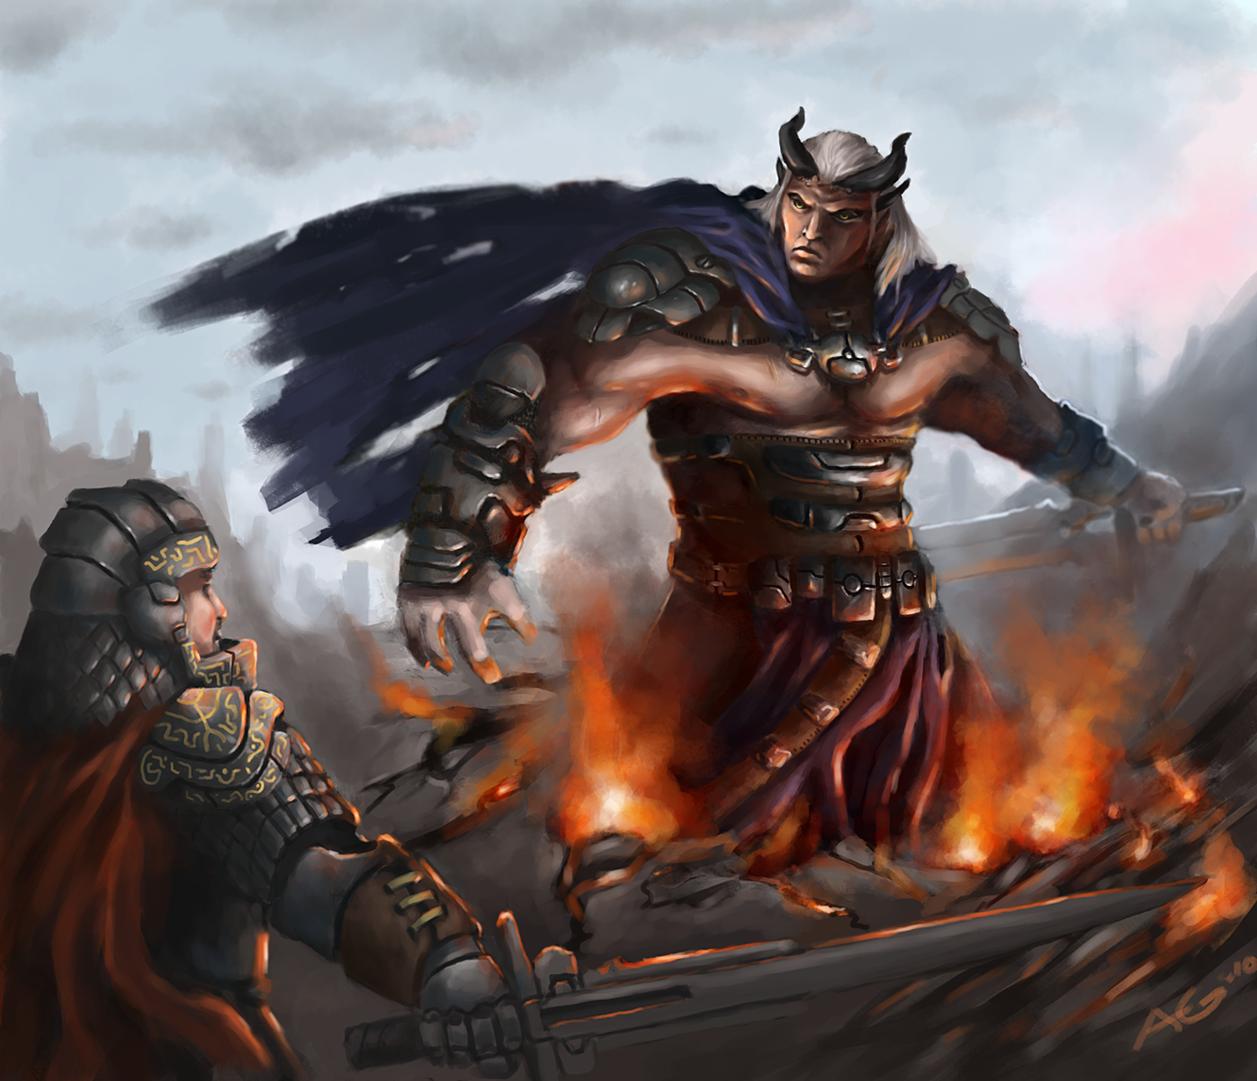 Dragon Age 2 - Qunari Titan by Adzerak